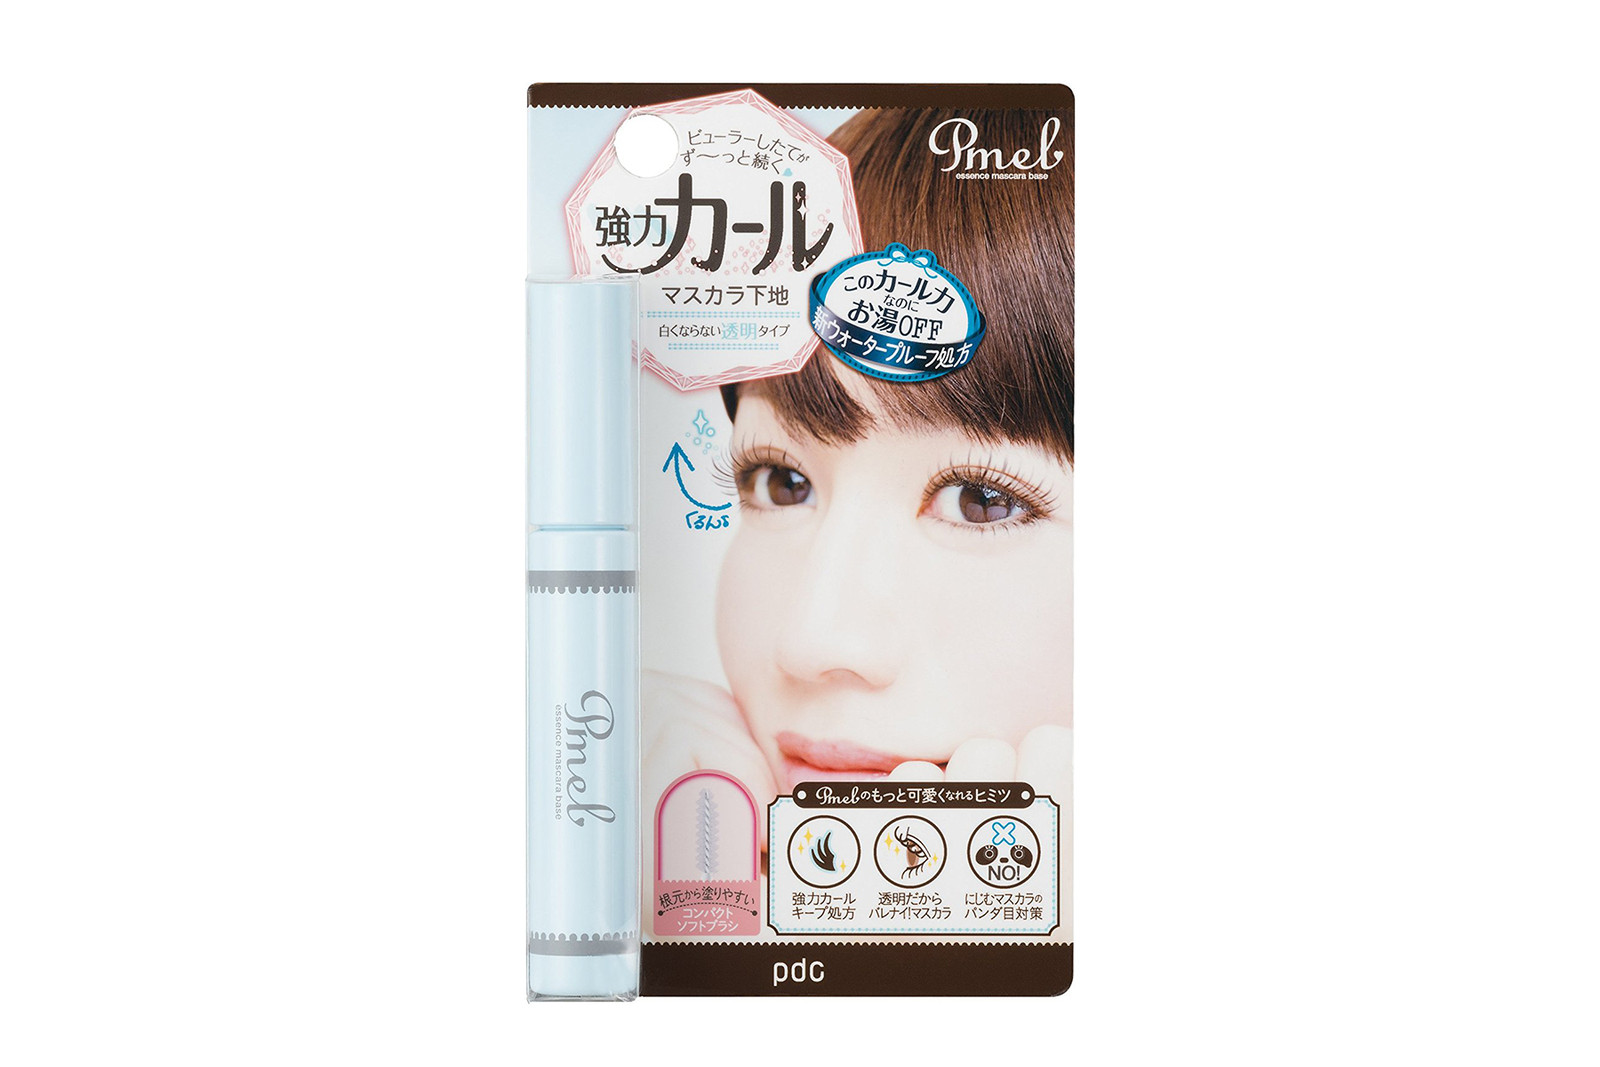 PDC Pmel Essence Mascara Base Lash Primer Makeup Glossier Slick Caution Hourglass Shu Uemura Curler